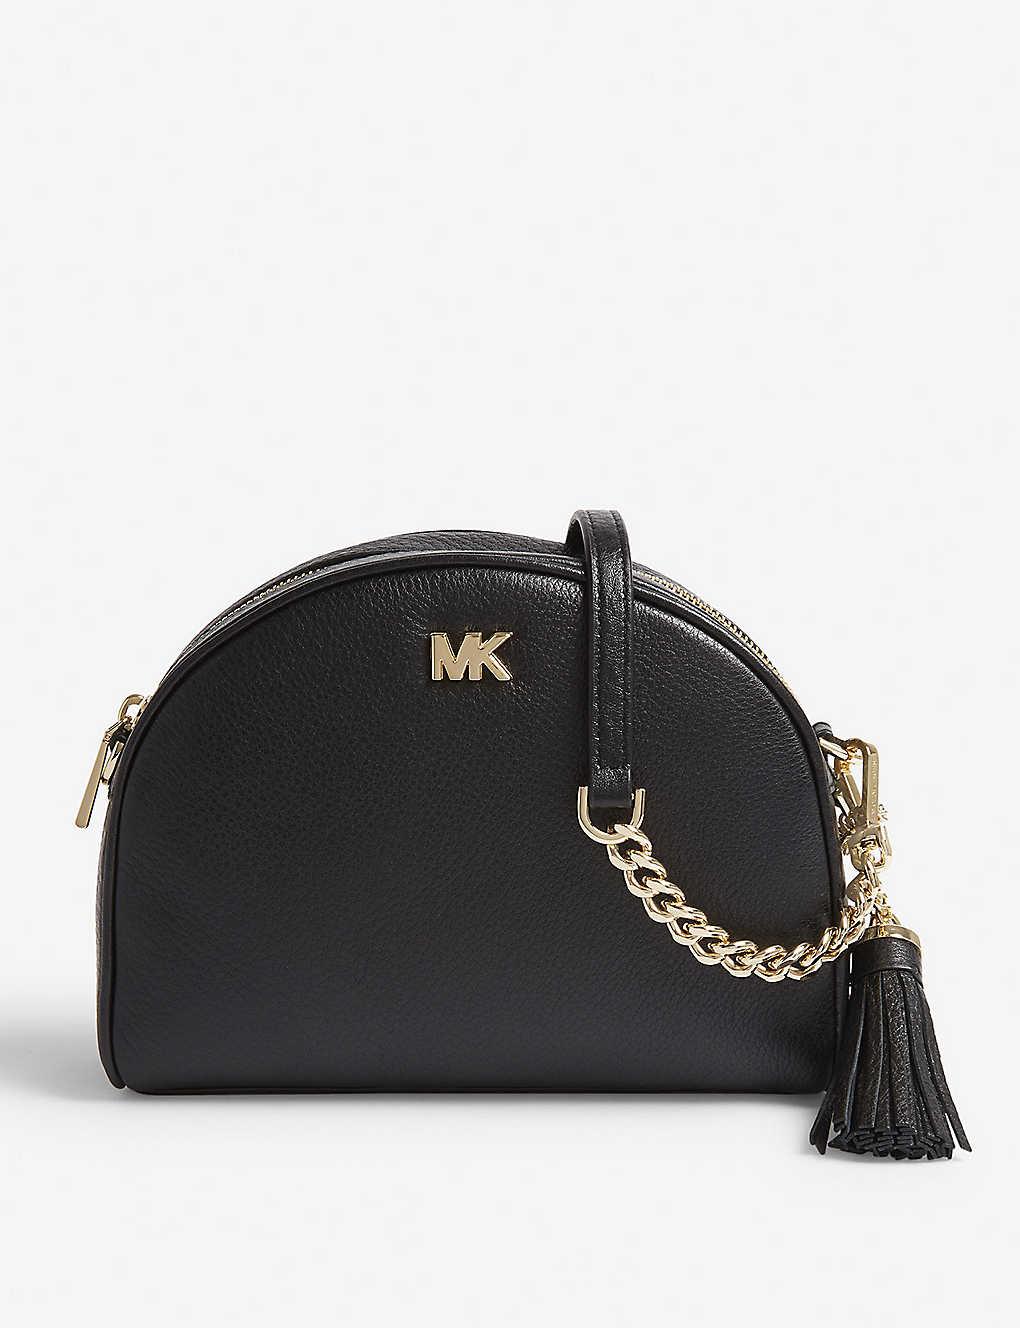 946284bd64d1 MICHAEL MICHAEL KORS - Half-moon pebbled leather shoulder bag ...